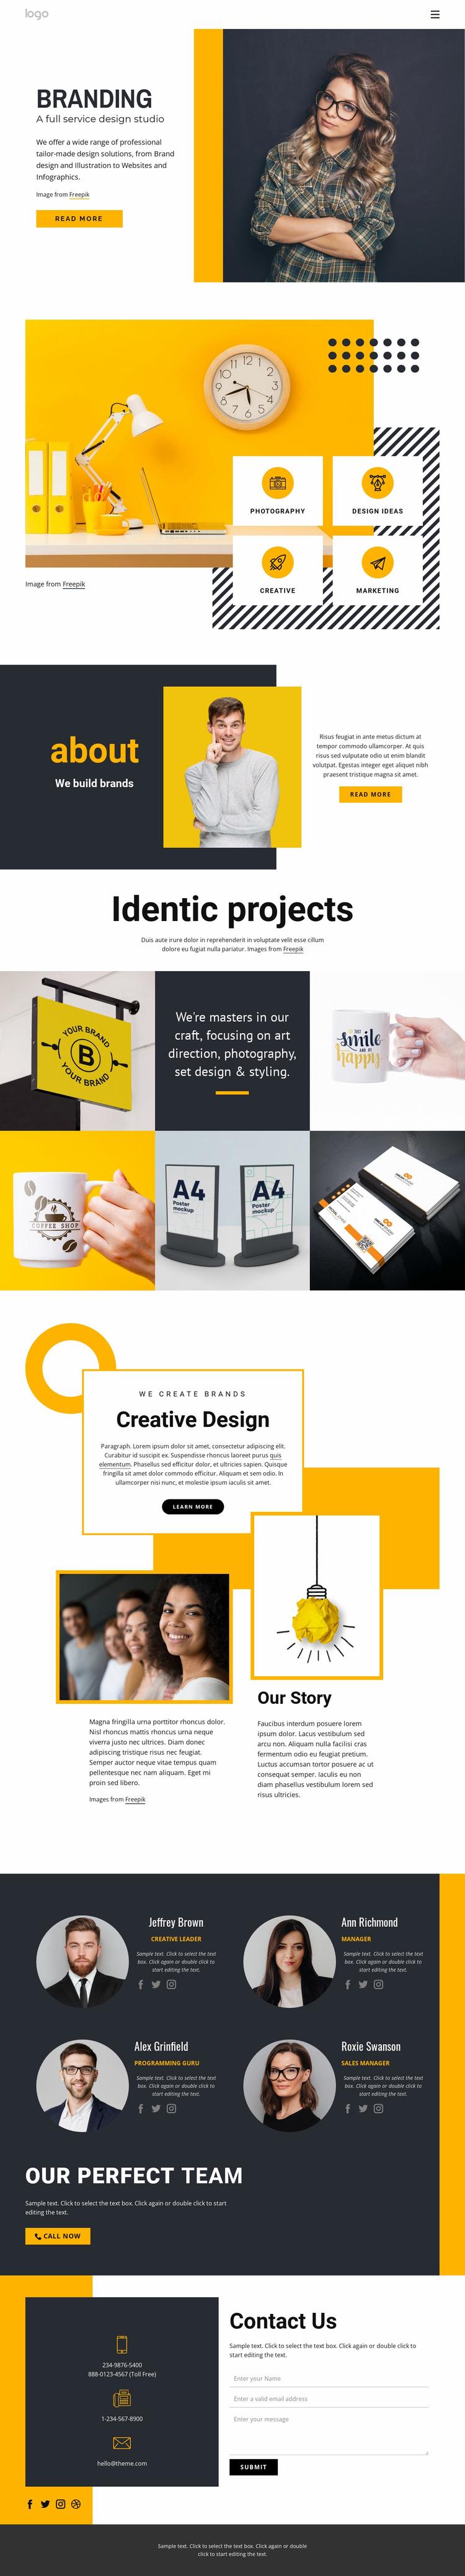 Full-service design studio Website Template